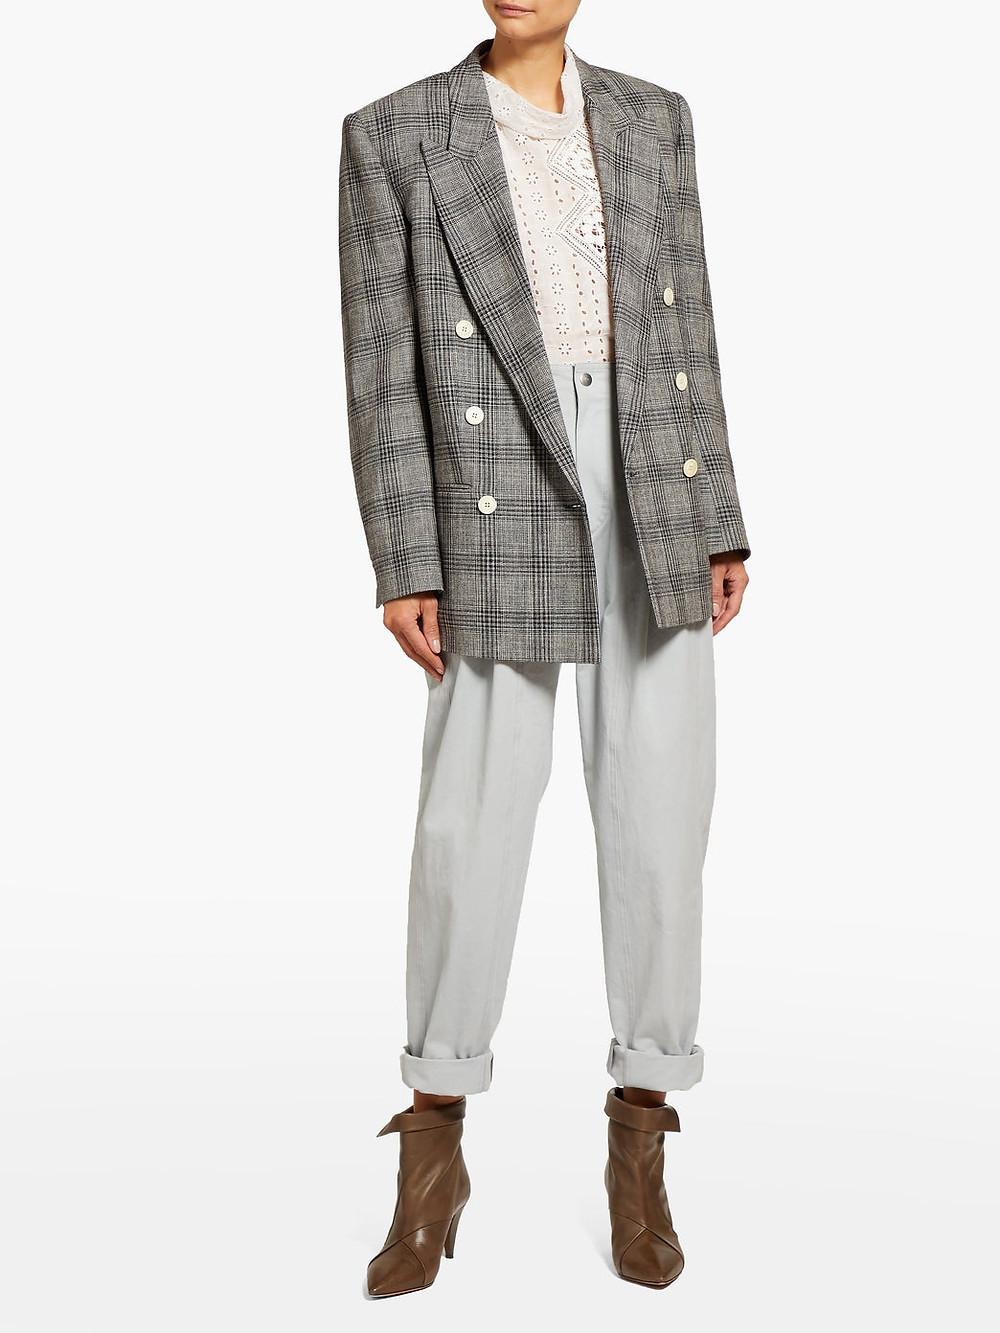 Isabel Marant Deagan checked exaggerated-shoulder wool blazer $1,015